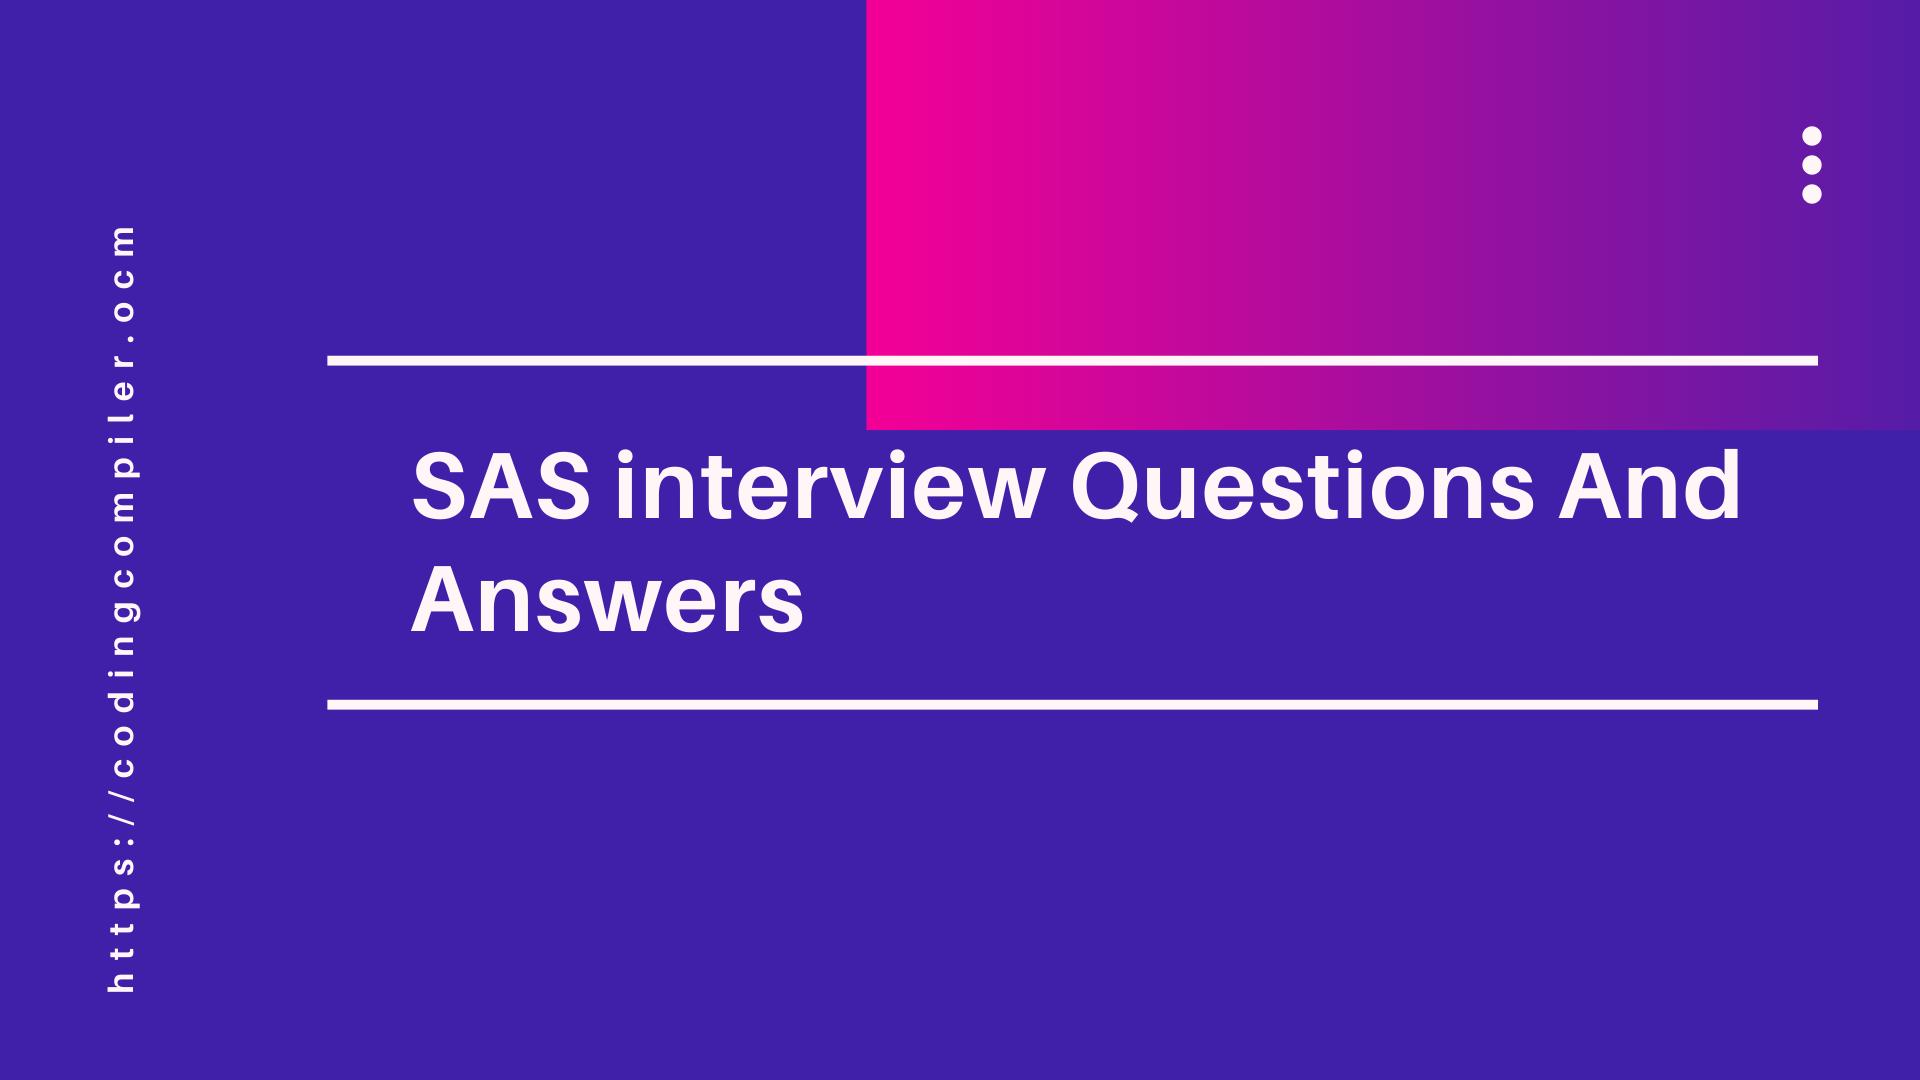 SAS Interview Questinos